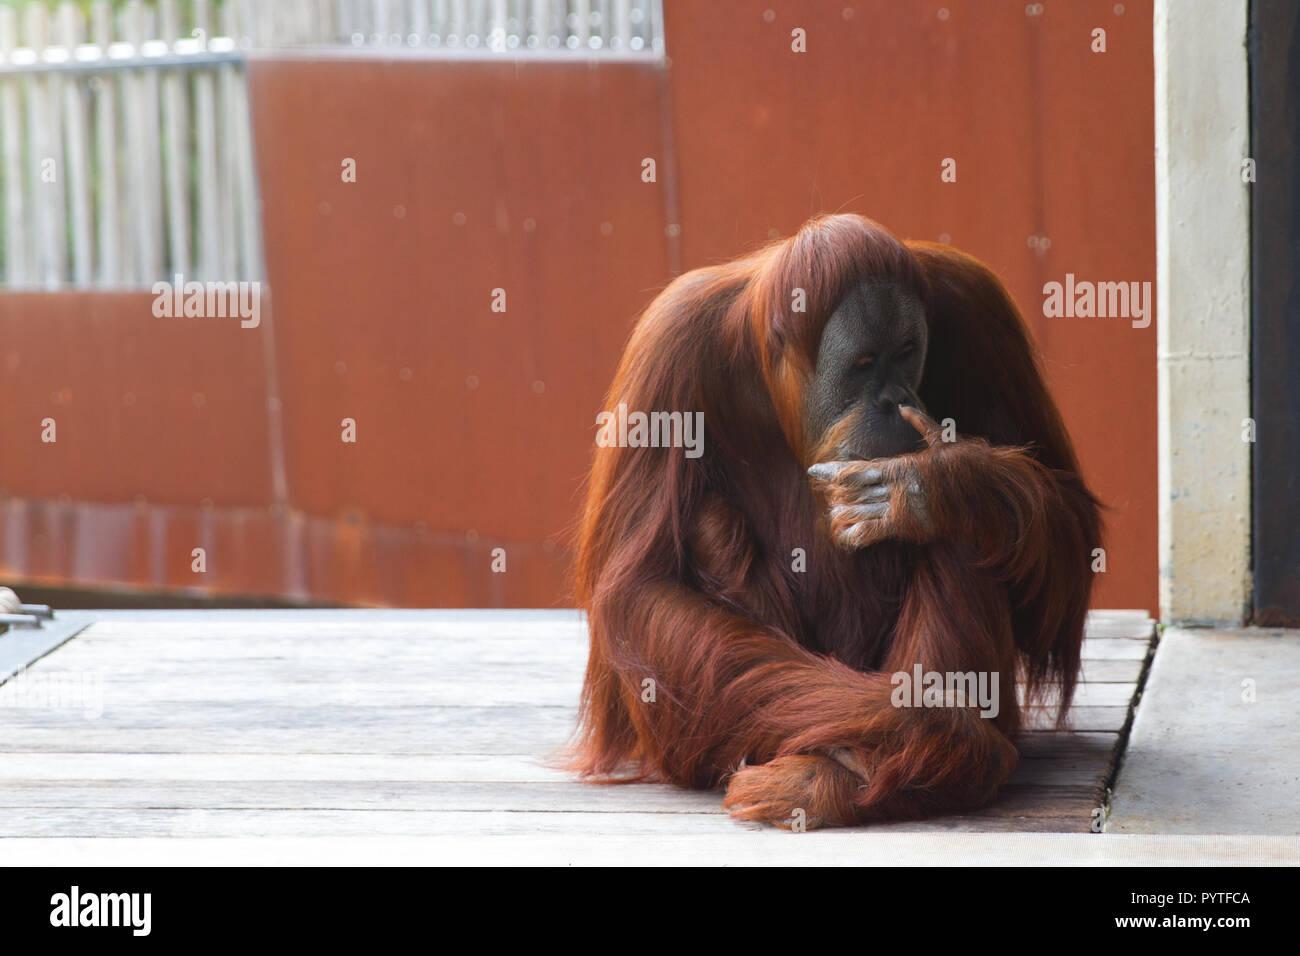 Orangutan sitting on platform, looking to the left, thinking. - Stock Image